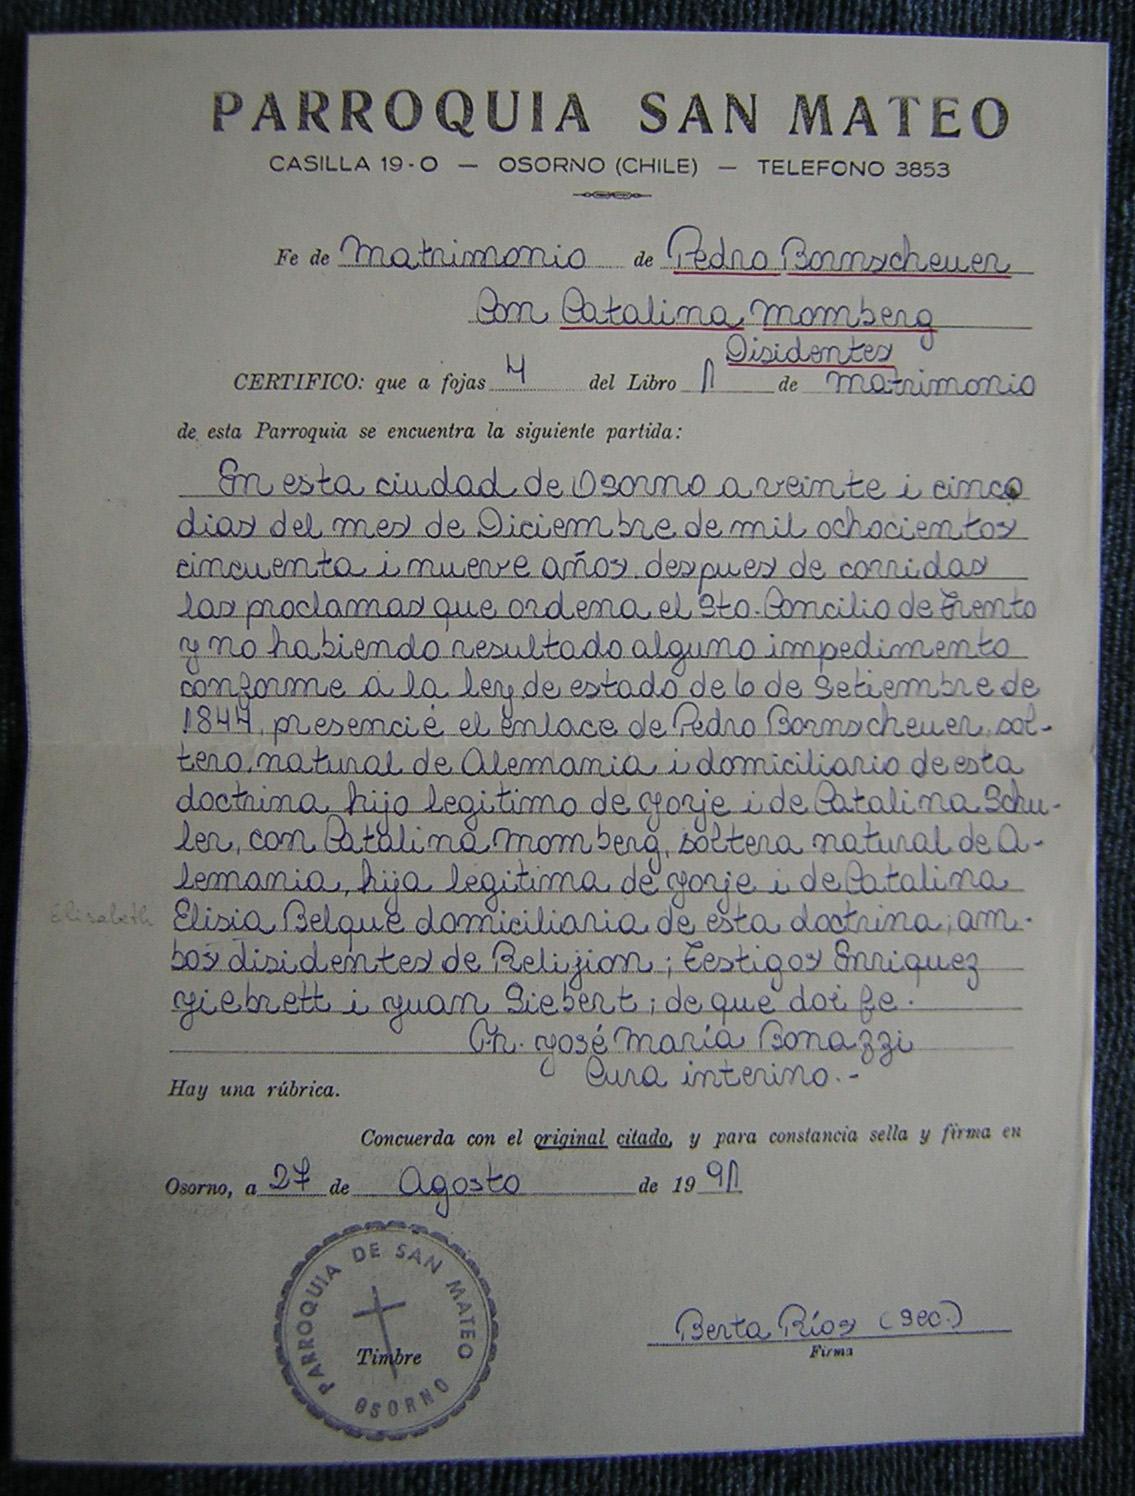 Certificado De Matrimonio Catolico : Familia bornscheuer genealog cl